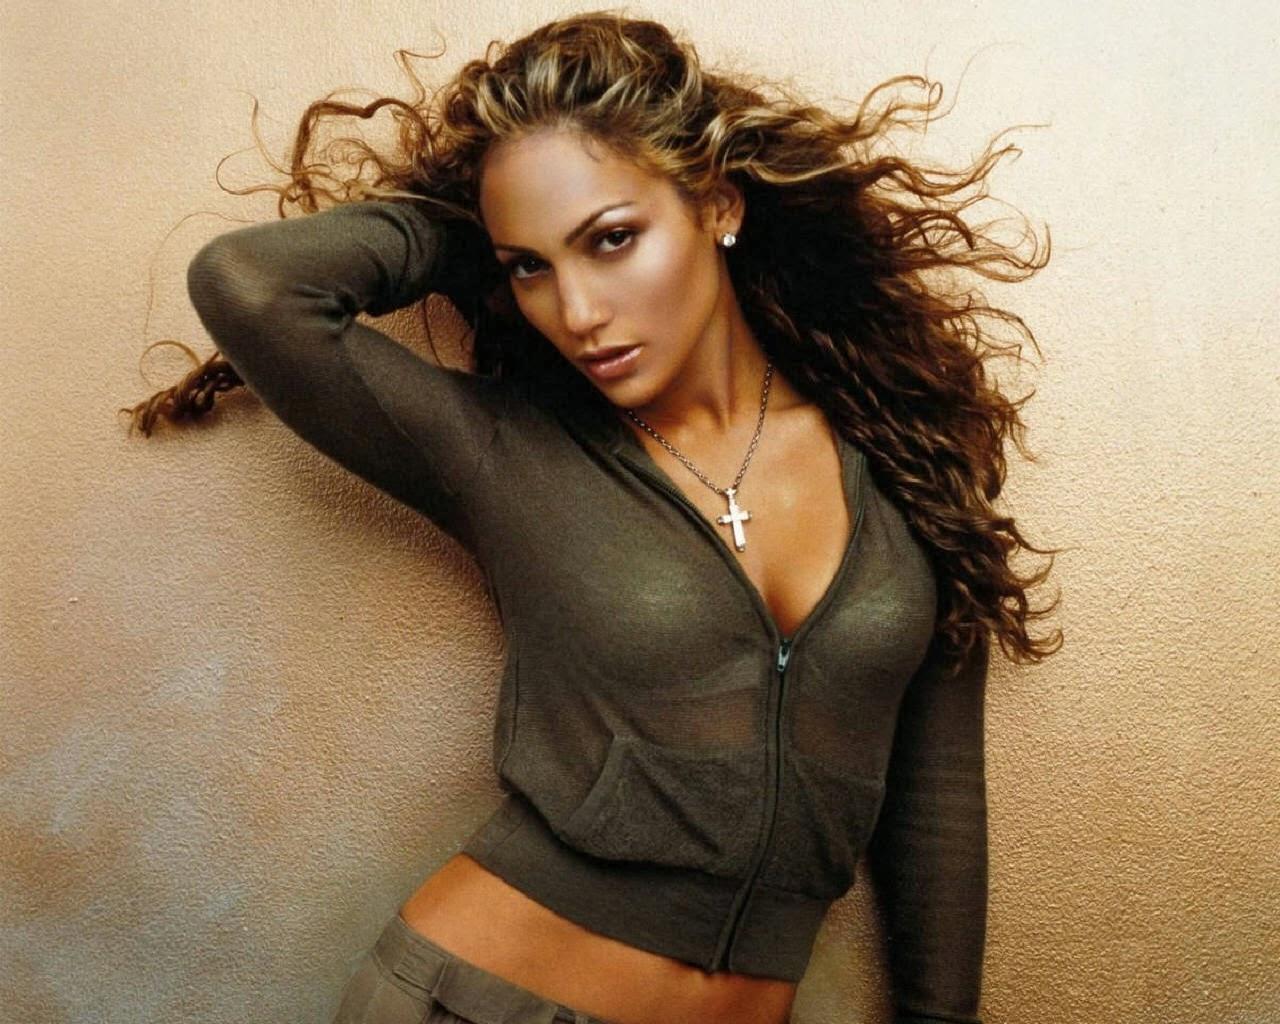 Shall We Dance Images Interview Hd Wallpaper And: HAYAT BENİM: Jennifer Lopez Ile Ricky Martin Aşk Mı Yaşıyor?